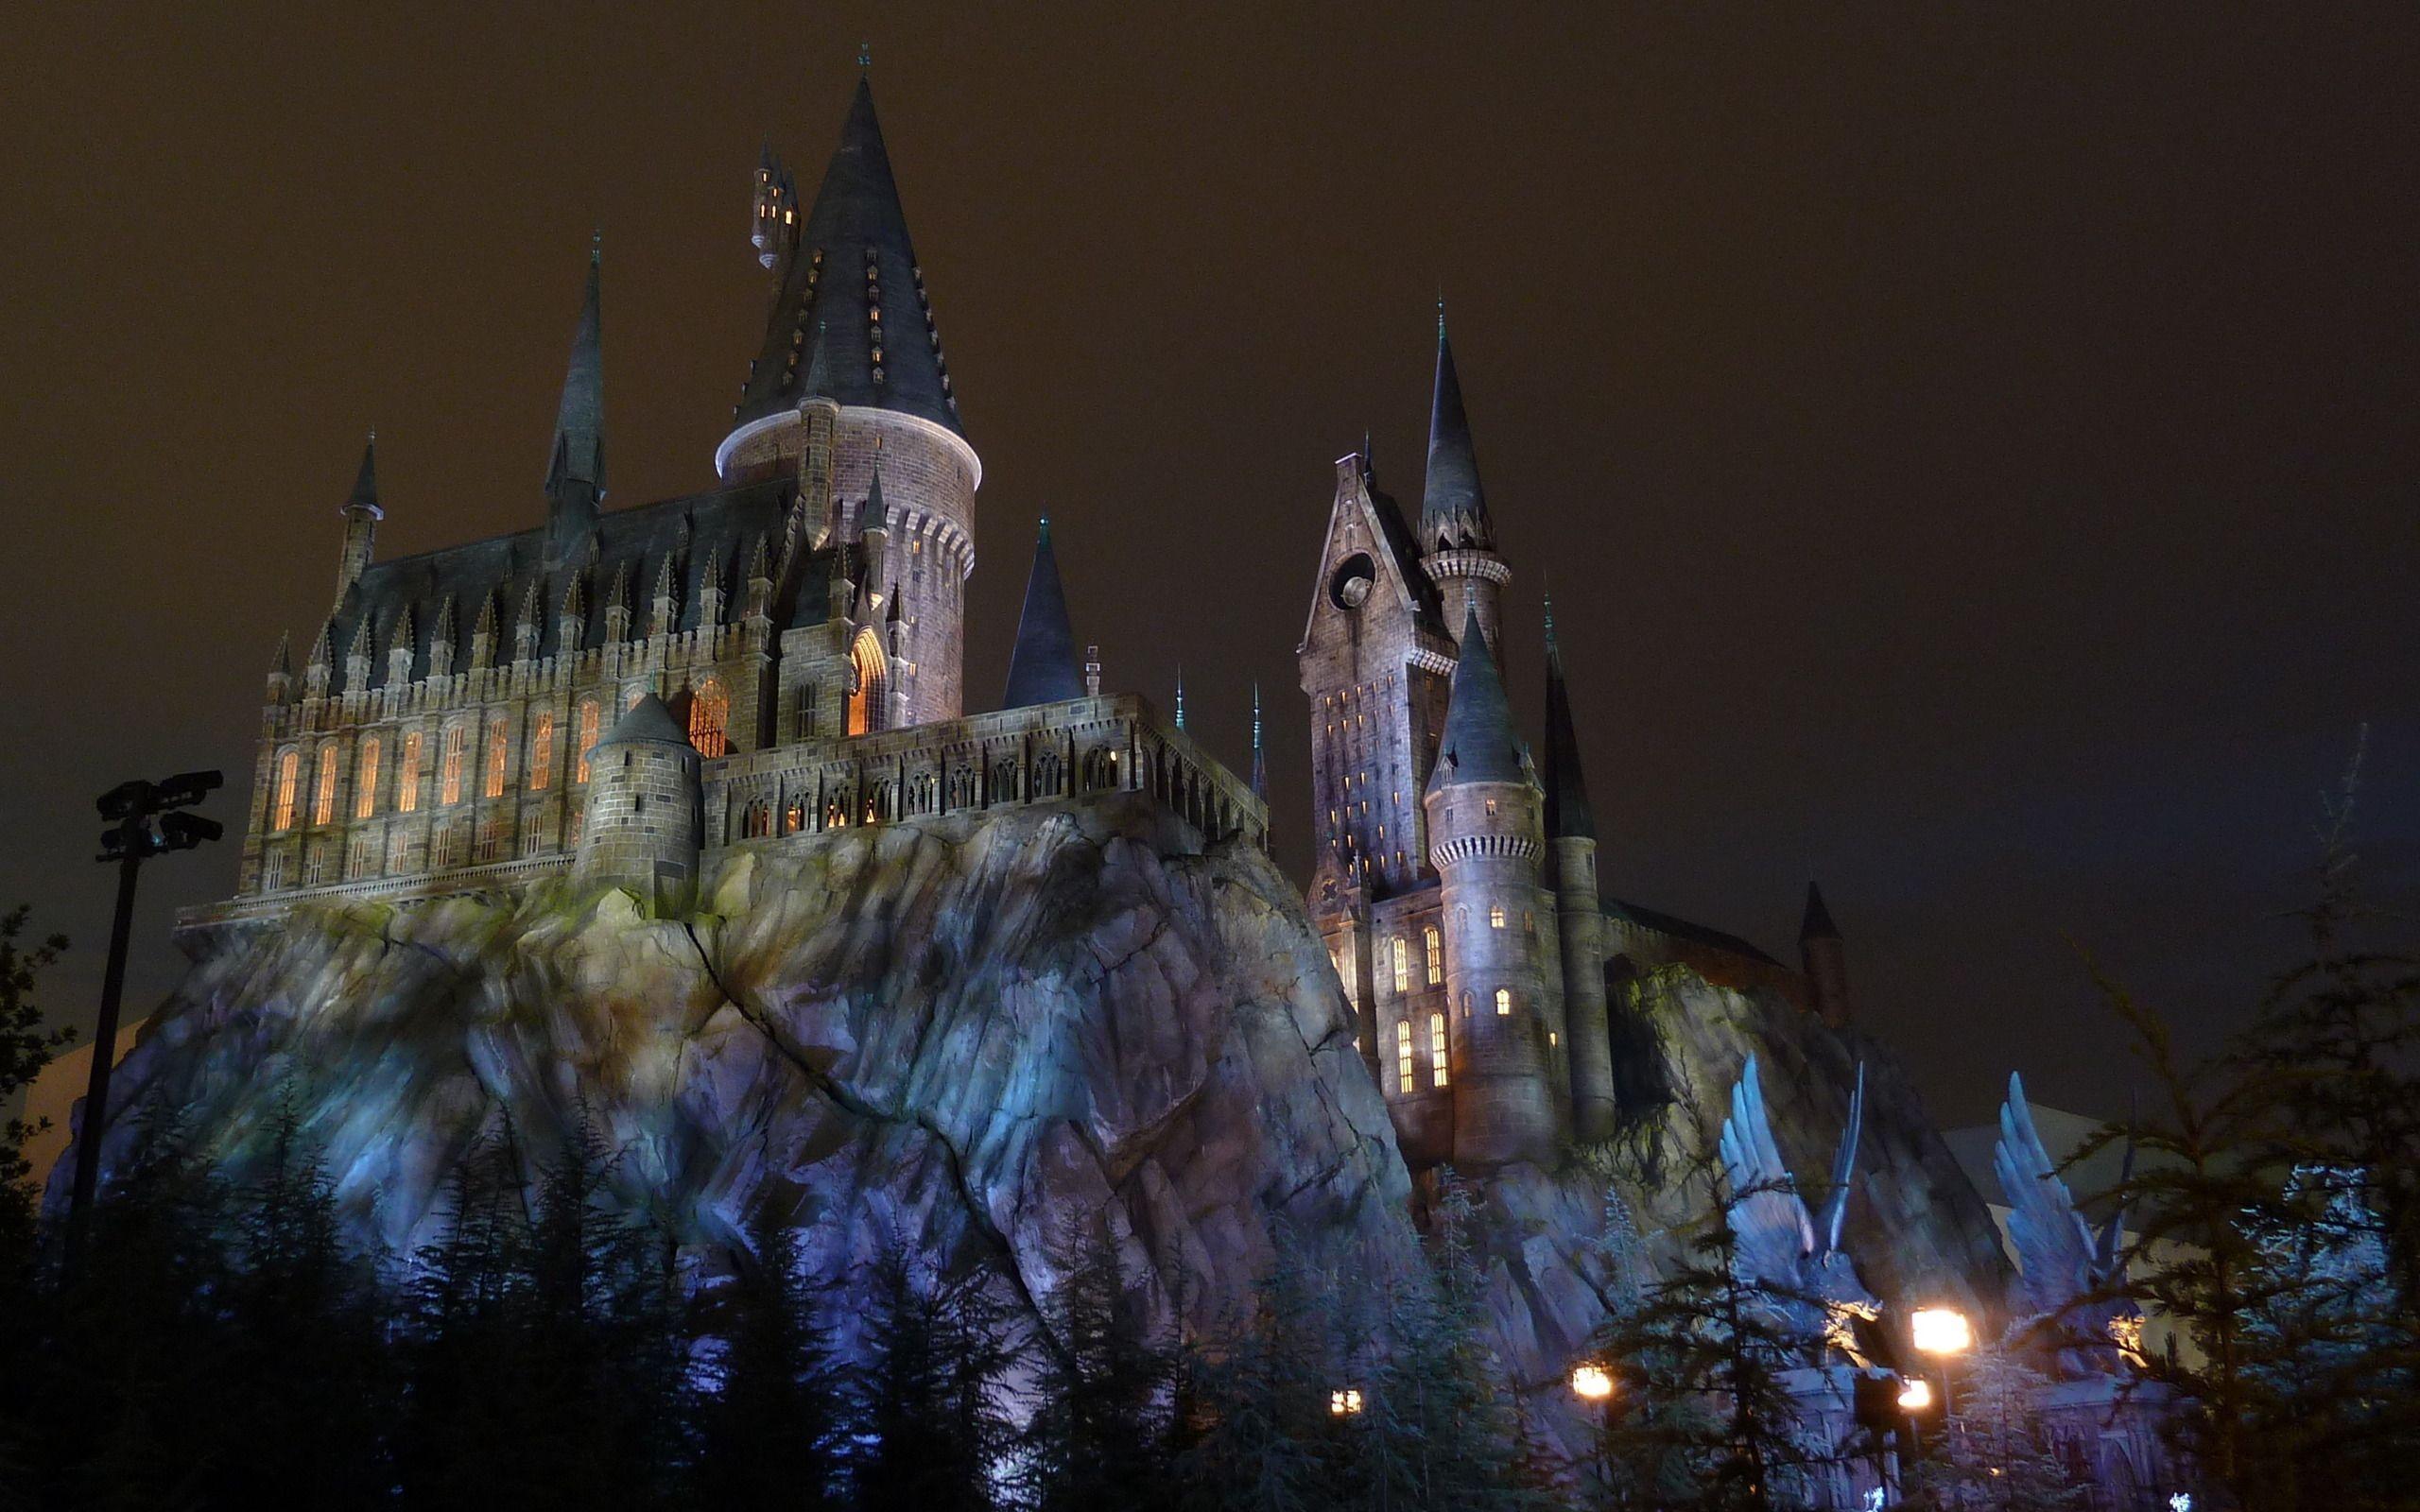 Hogwarts Castle Wallpapers Top Free Hogwarts Castle Backgrounds Wallpaperaccess